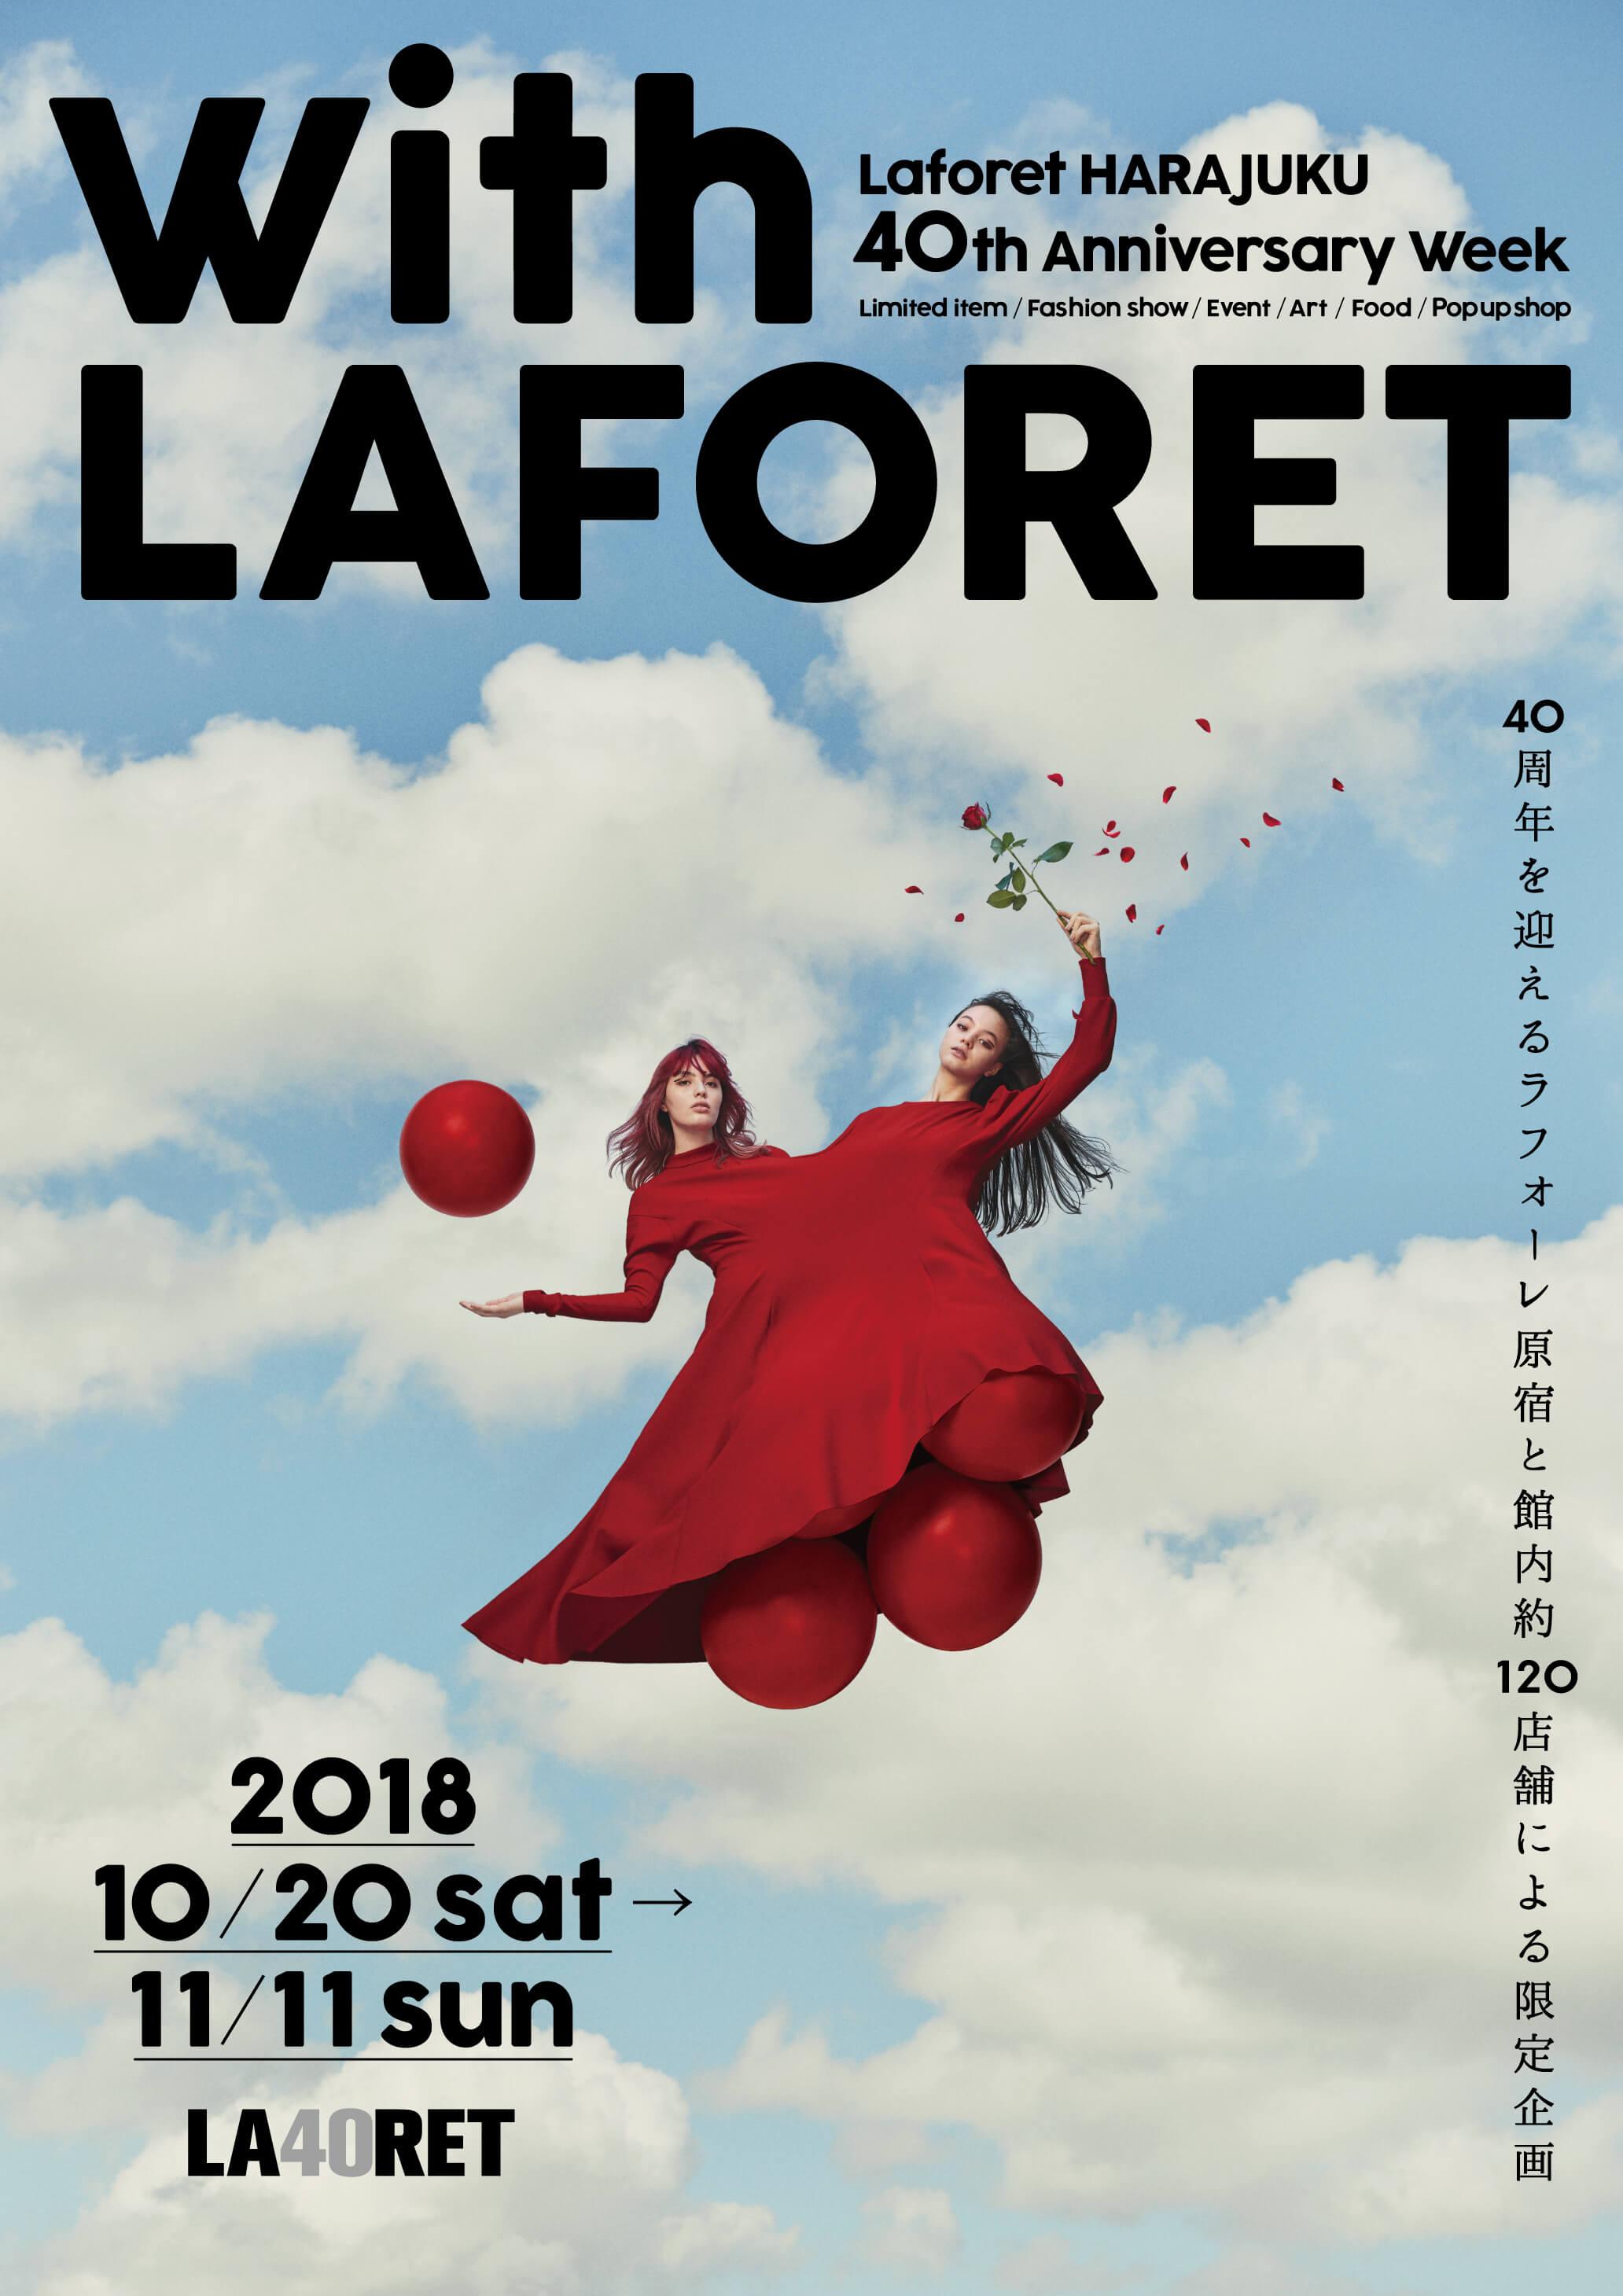 Laforet原宿40週年!記念性單品與知名品牌的快閃店限定開幕 Laforet原宿、